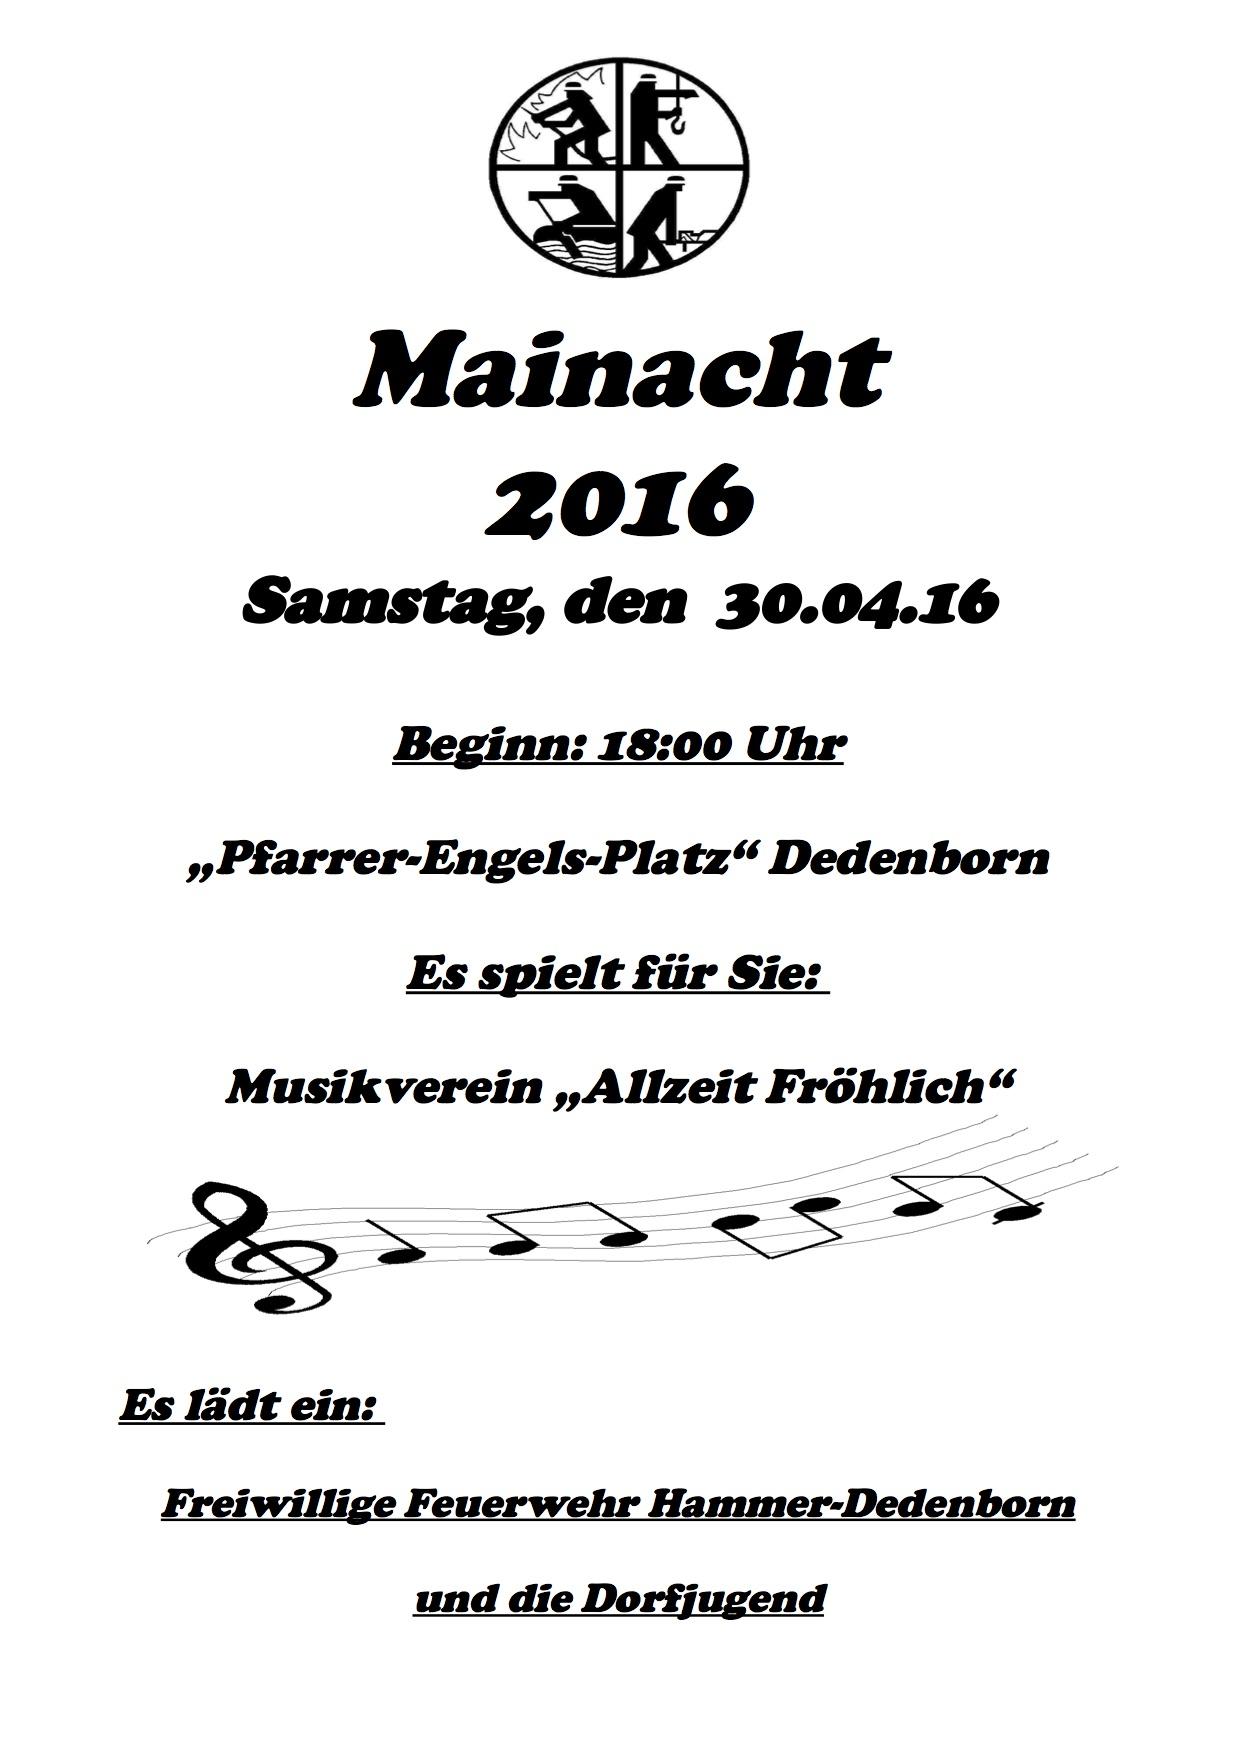 Einladung Mainacht 2016